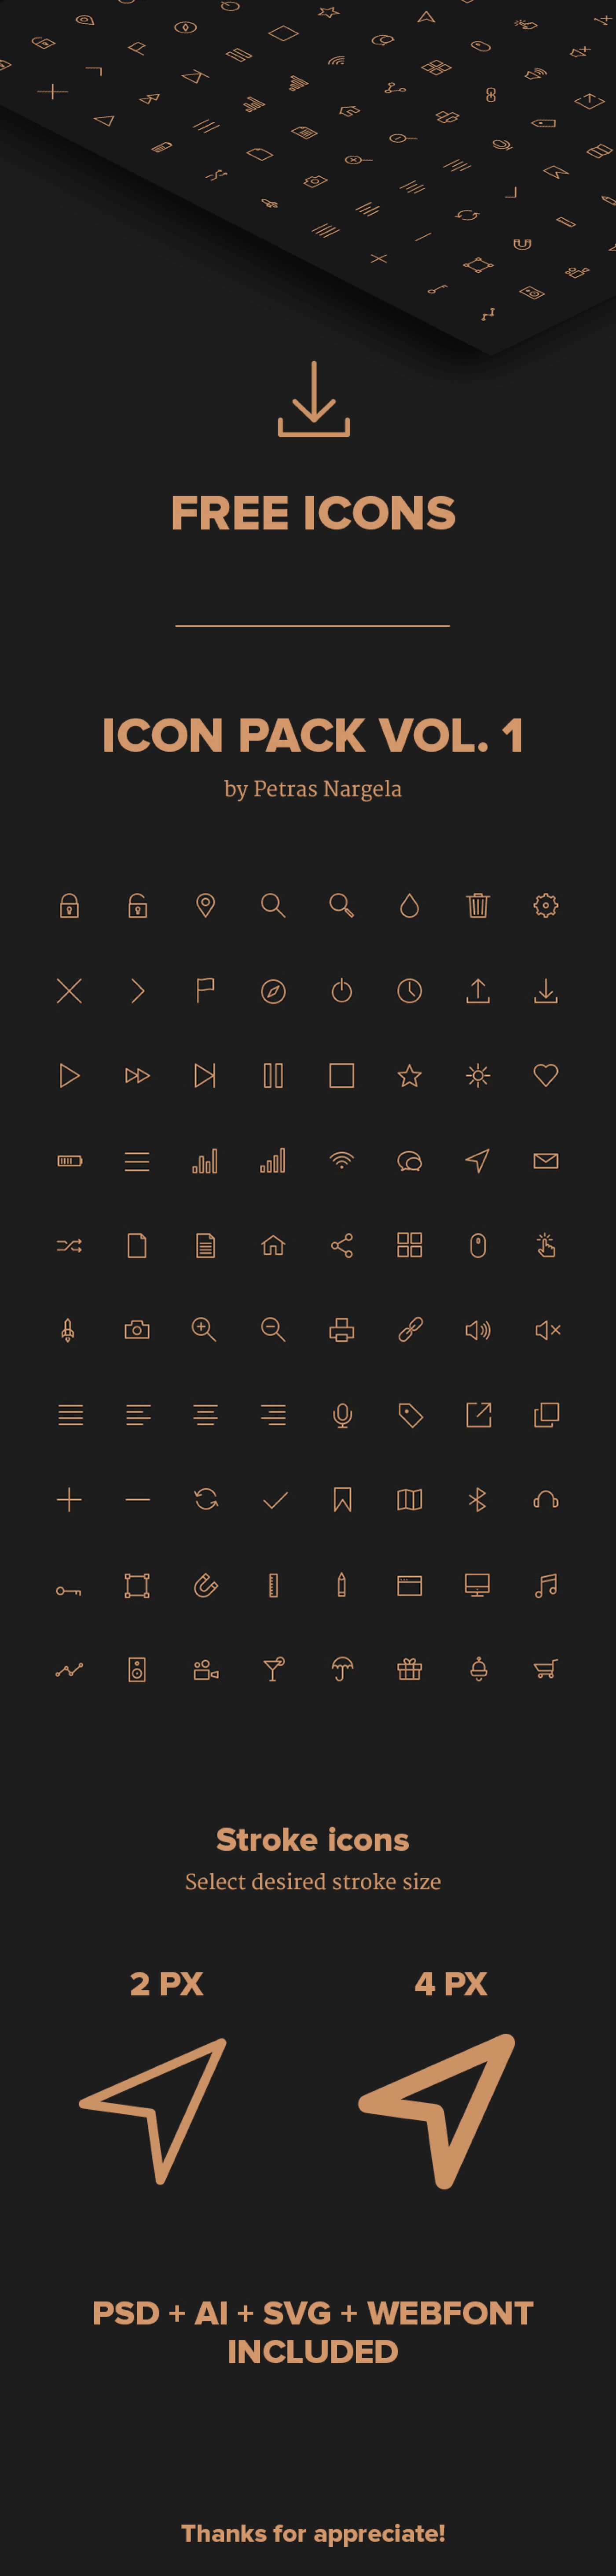 UI ios7 ux clean free icons psd ai Pack svg download webfont set uiux Webdesign